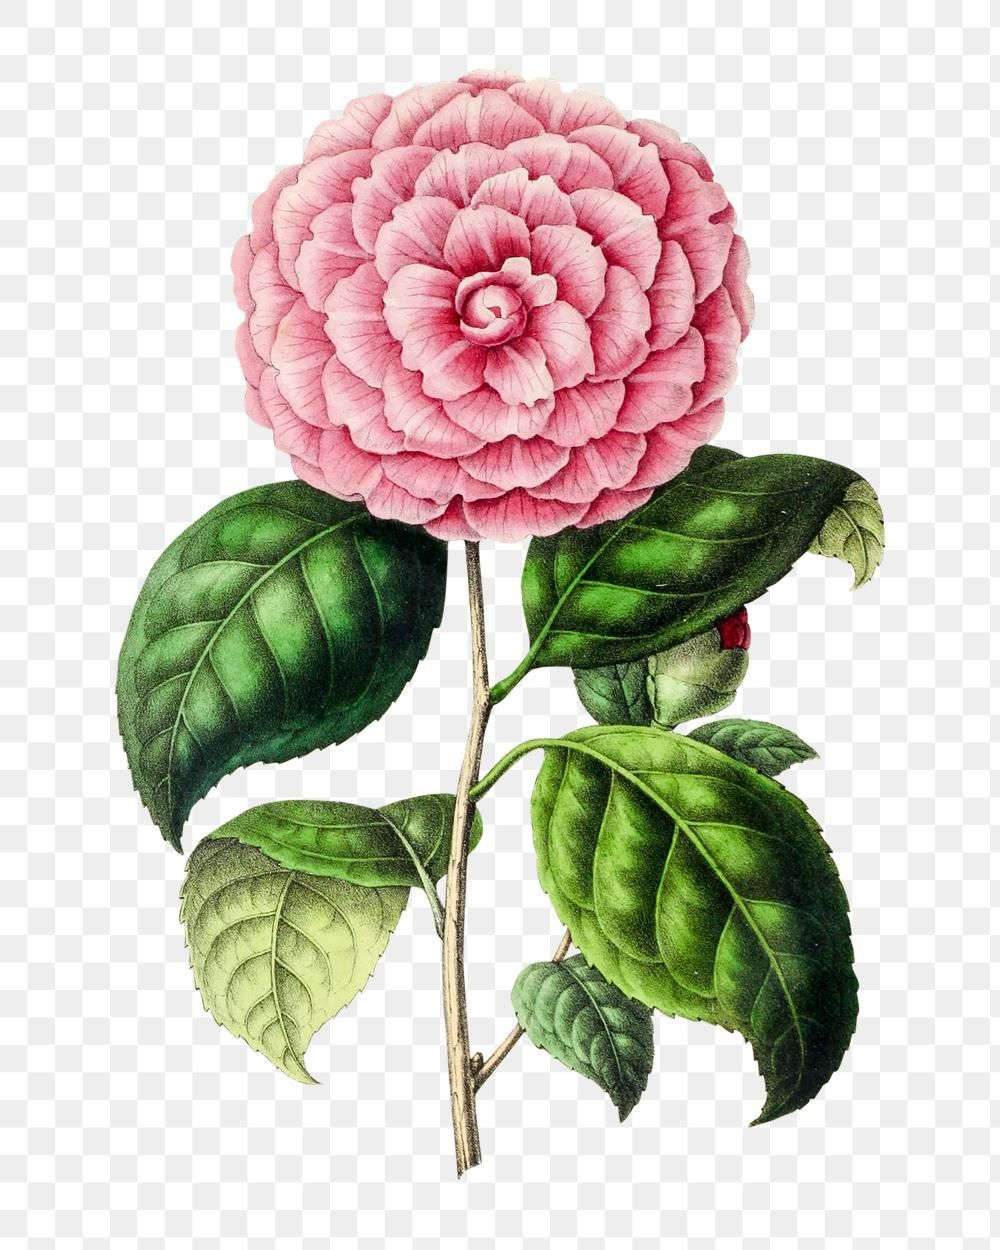 Hand Drawn Pink Camellia Flower Design Element Free Image By Rawpixel Com In 2020 Camellia Flower Design Element Botanical Illustration